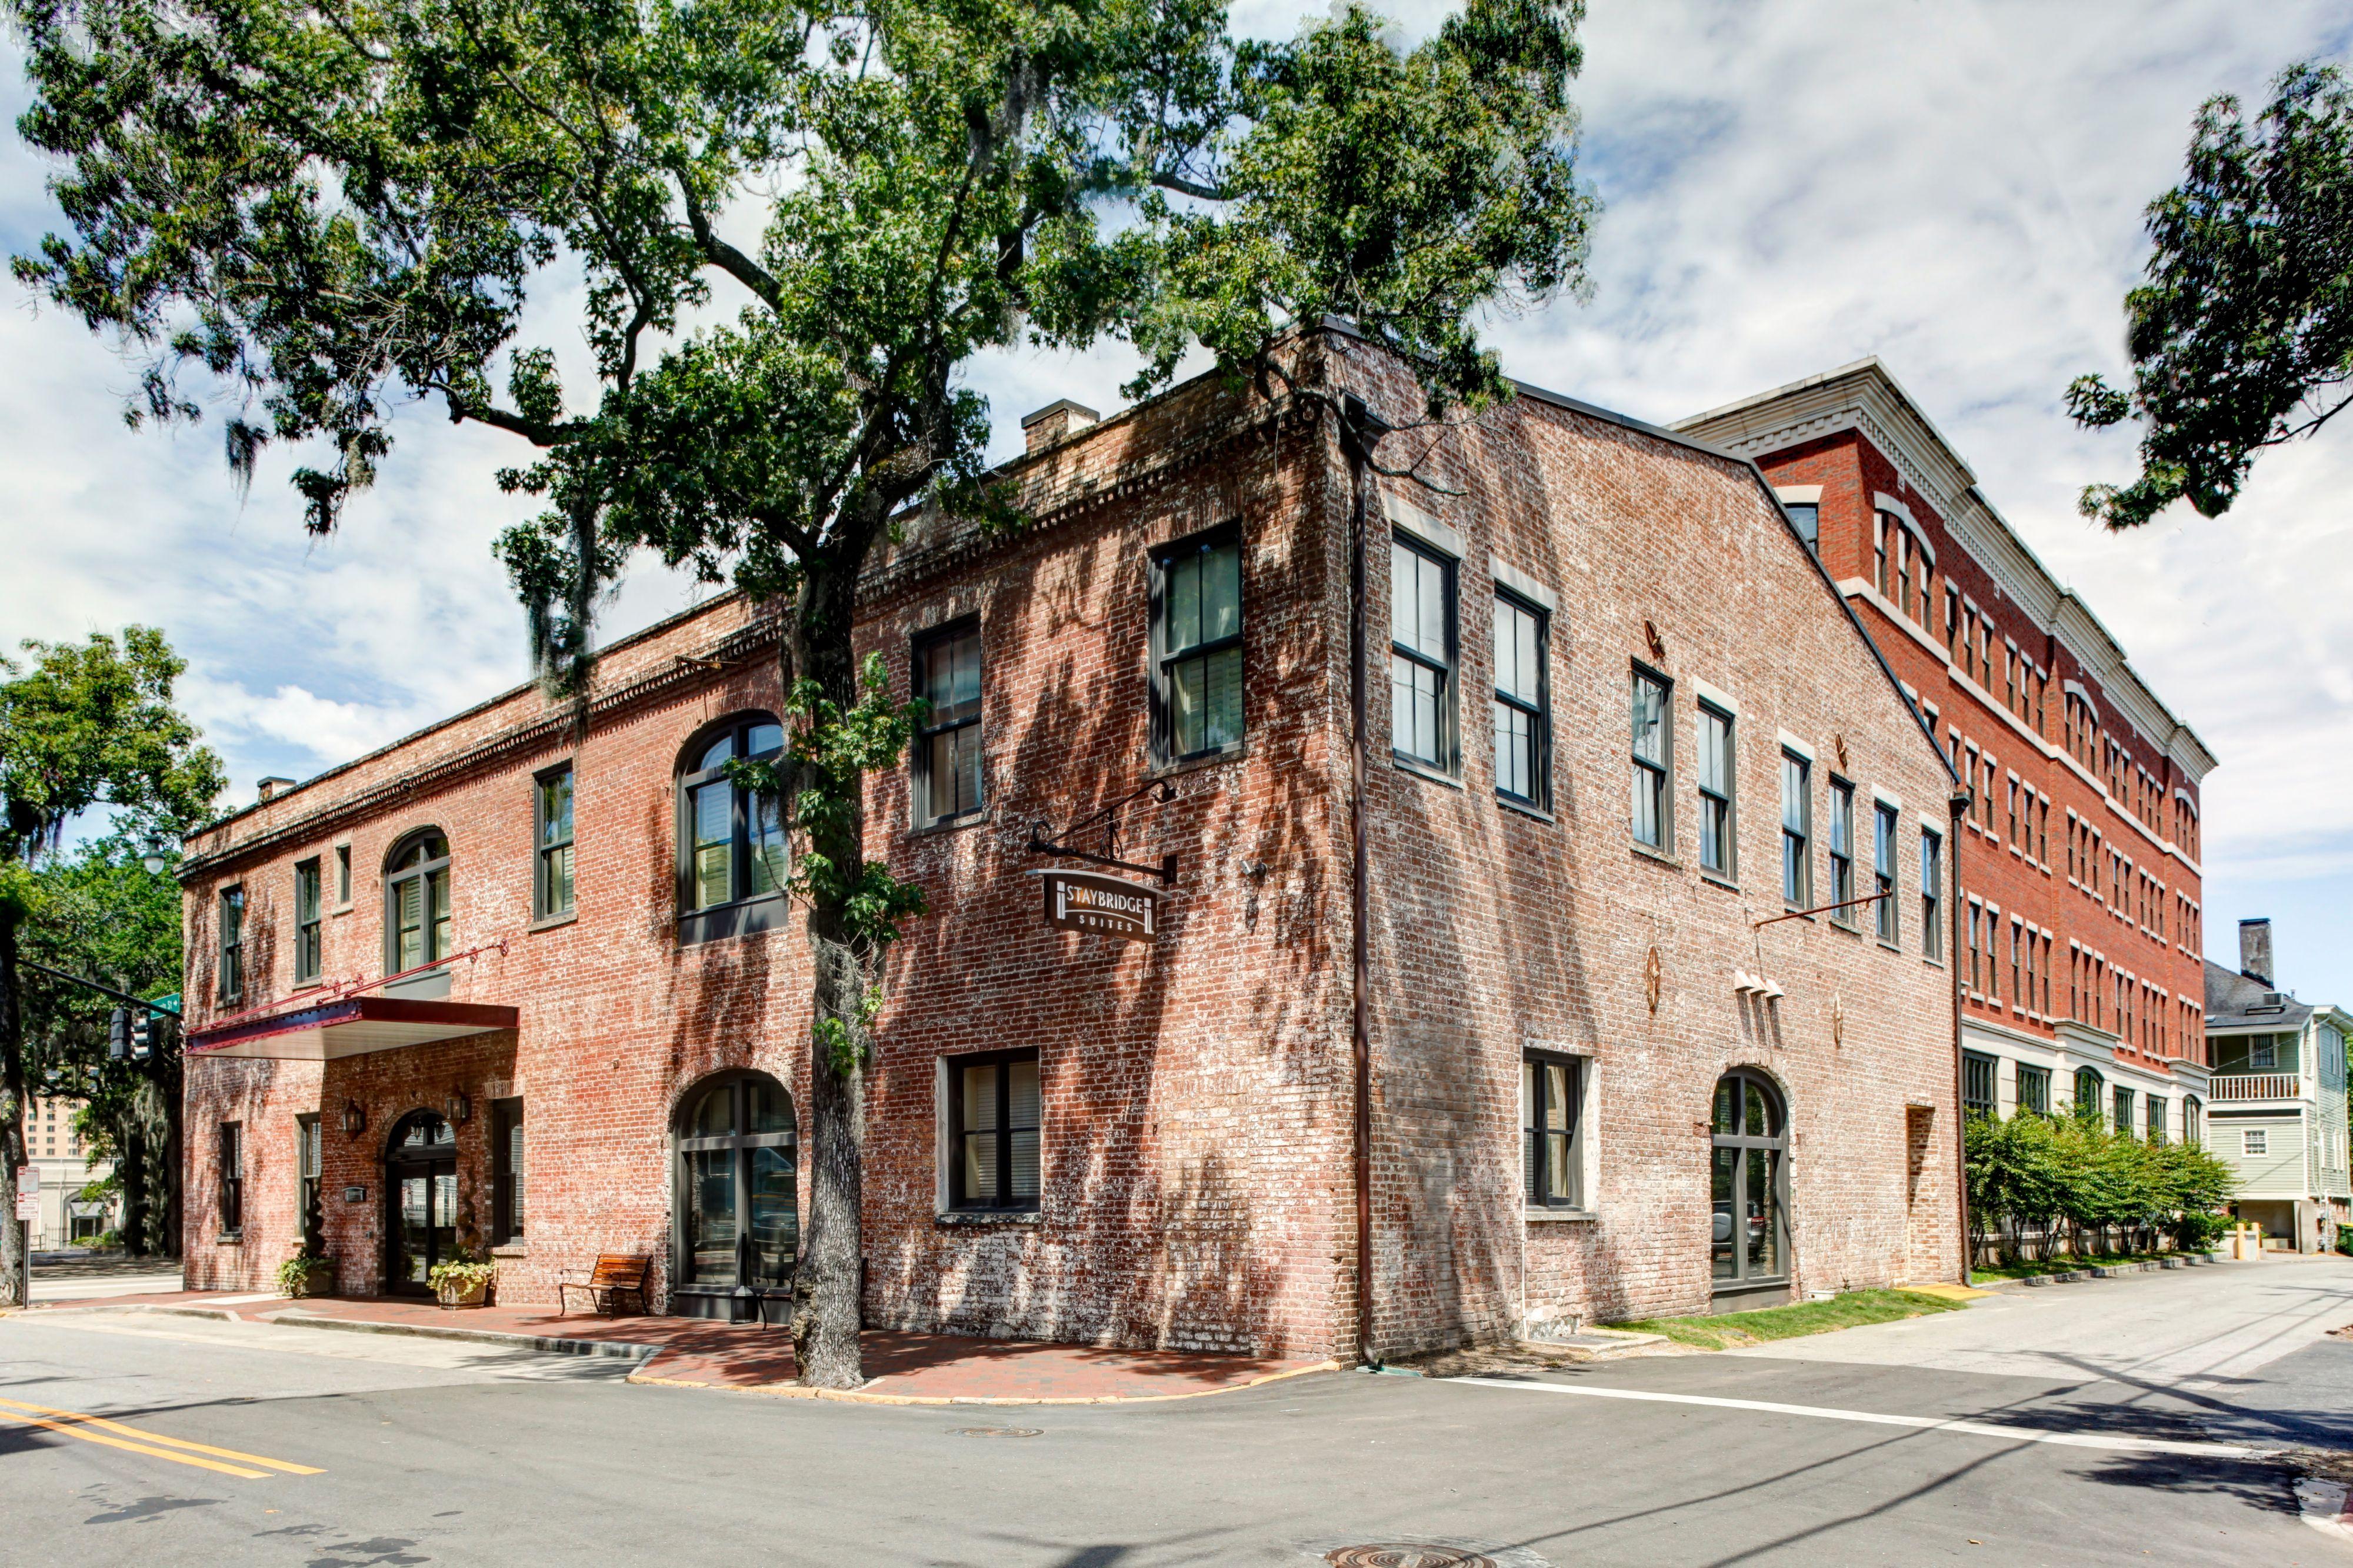 Hotels In Savannah Ga Historic District Staybridge Suites Savannah Historic District